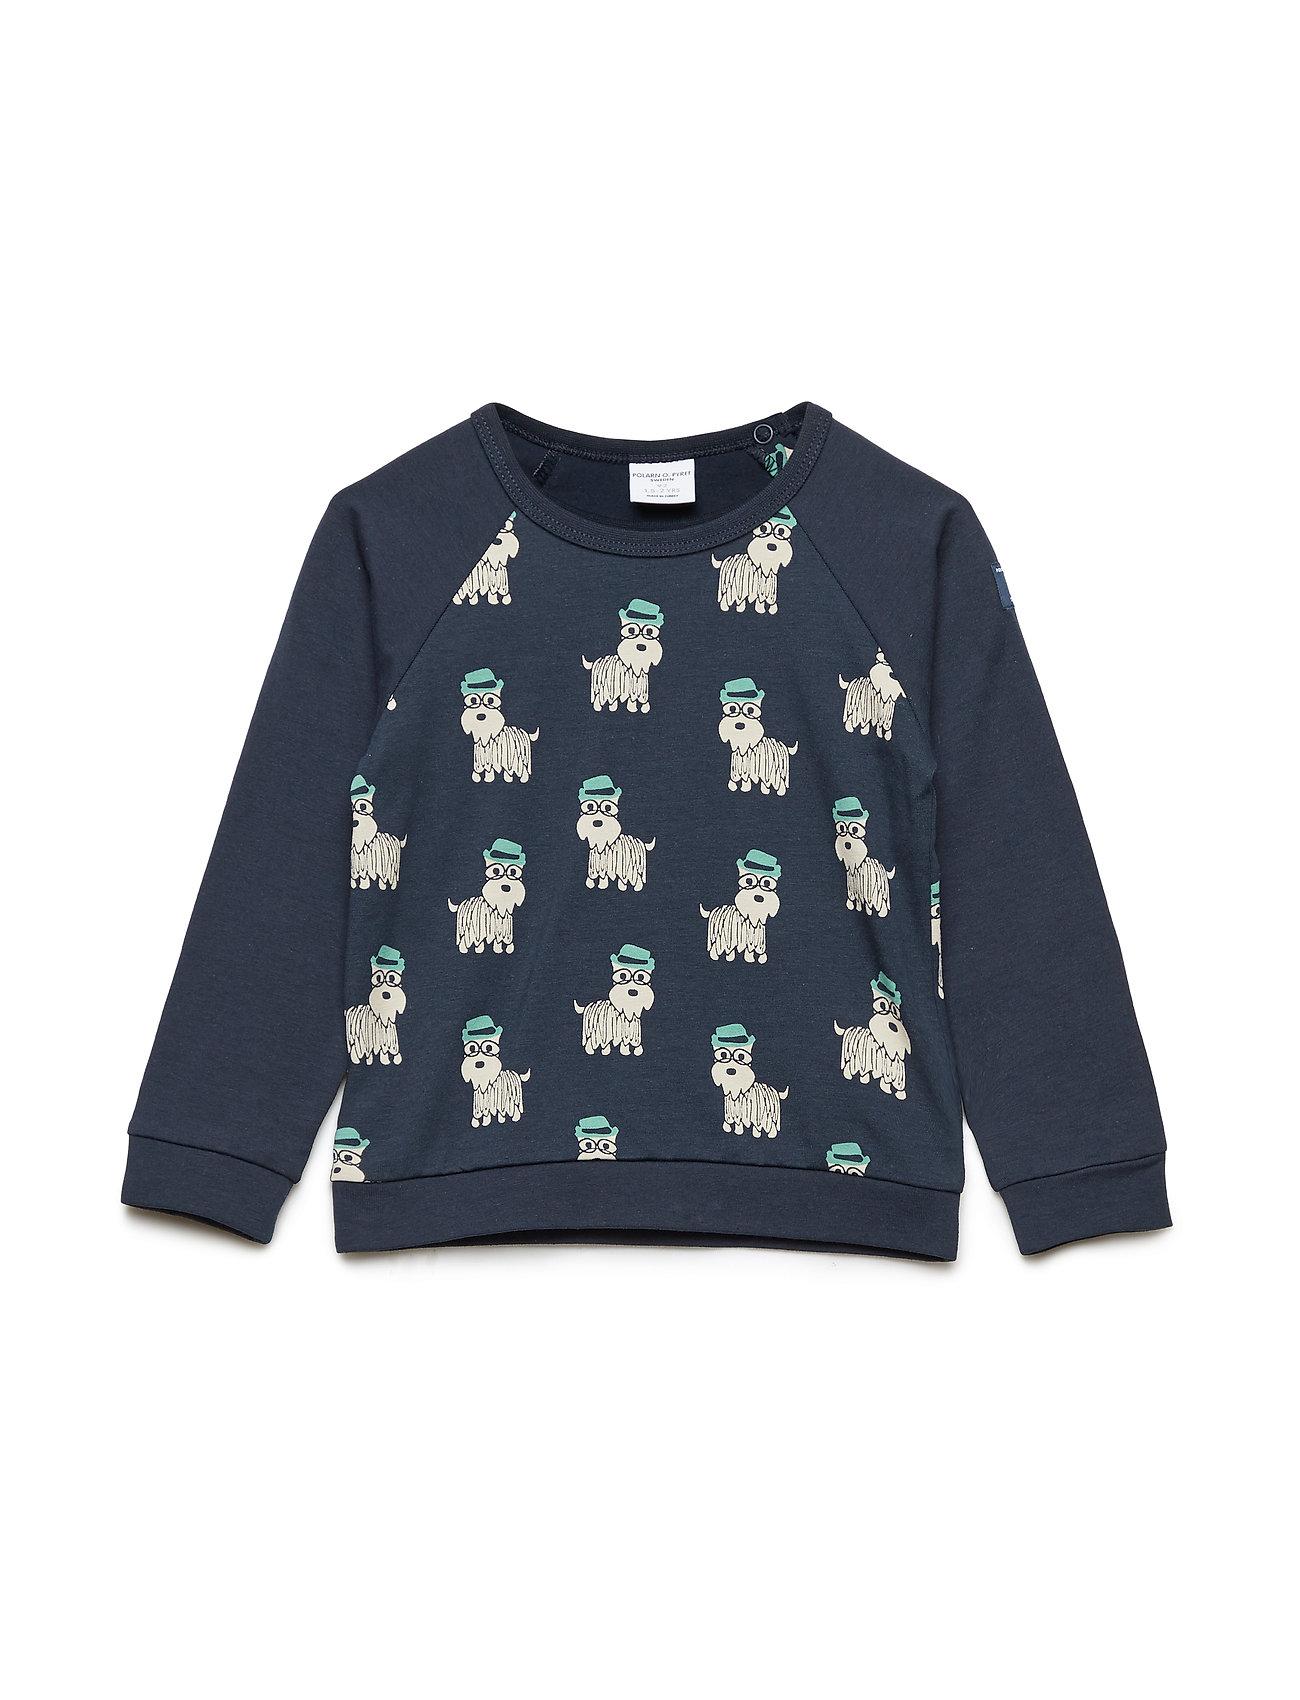 Polarn O. Pyret T-shirt with print Preschool